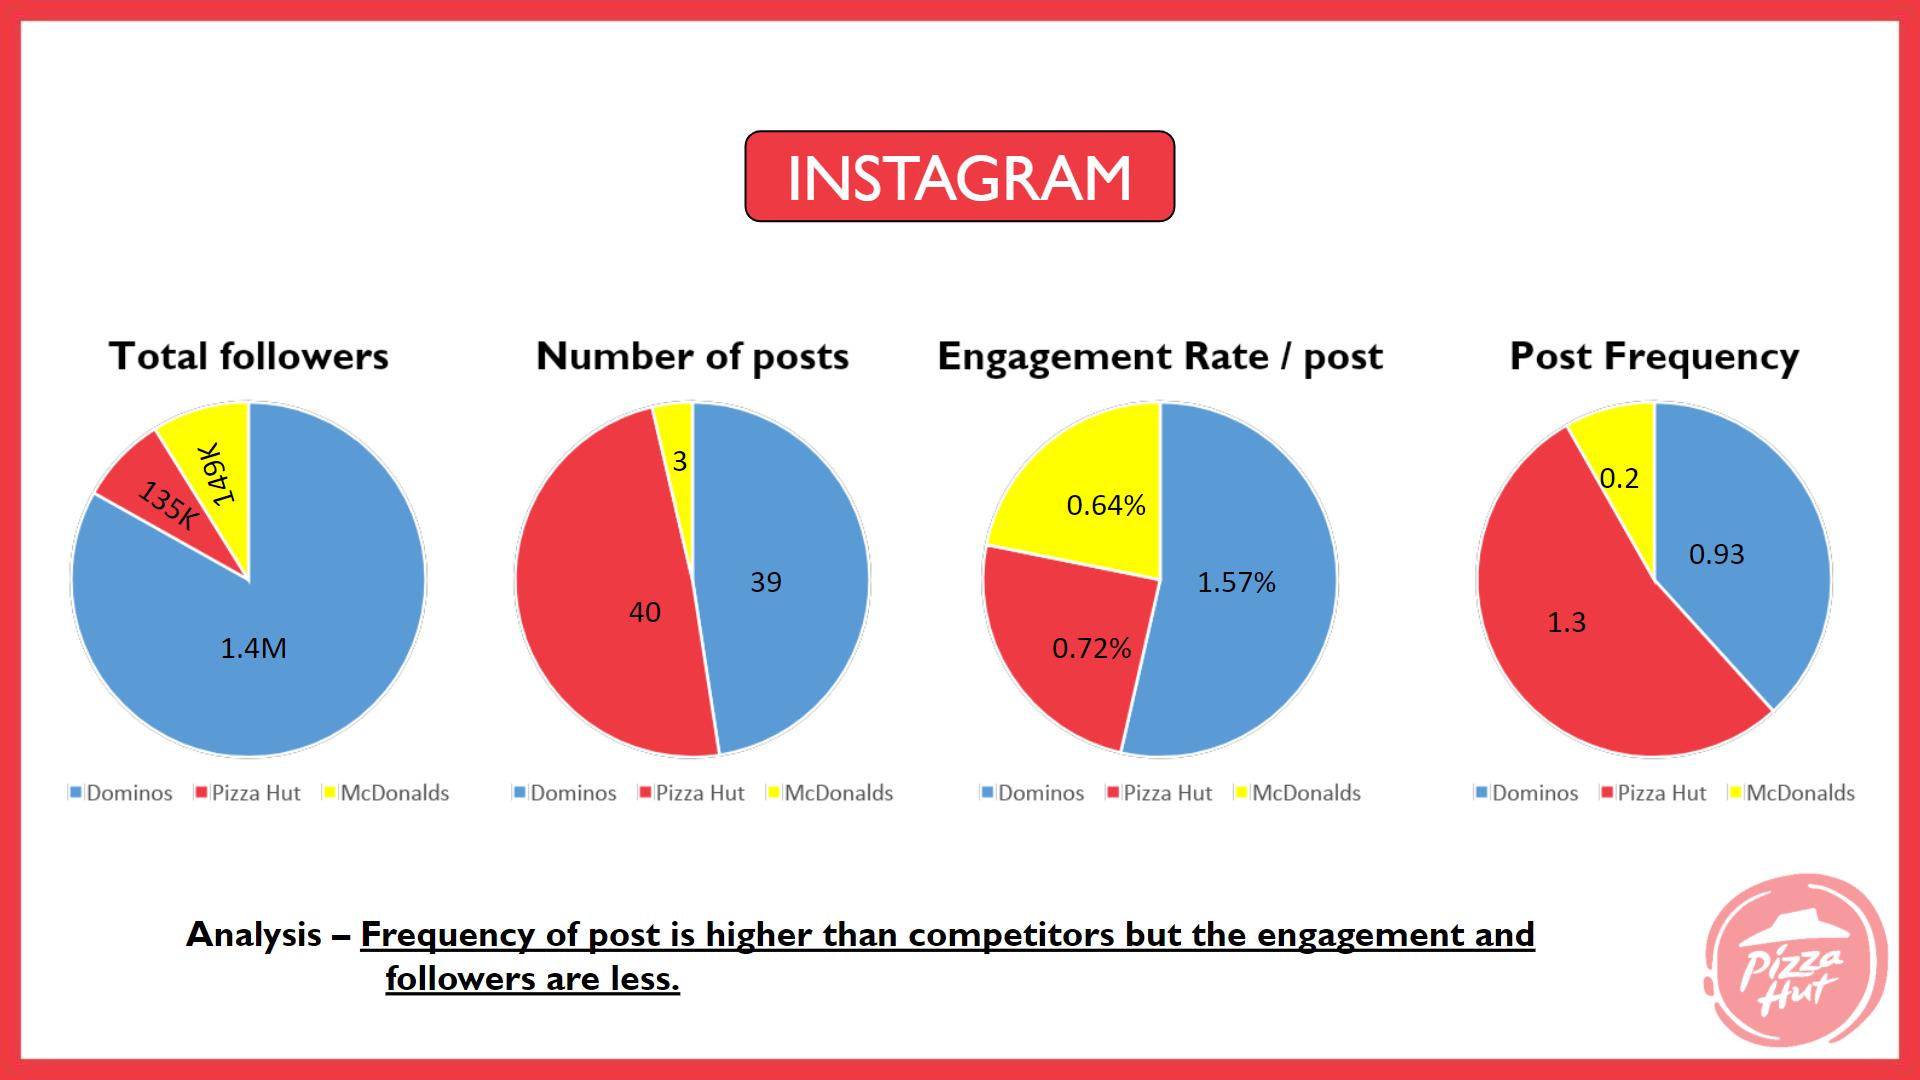 pizza hut marketing strategy Instagram Analysis - Pizza Hut Marketing and Advertising Strategy